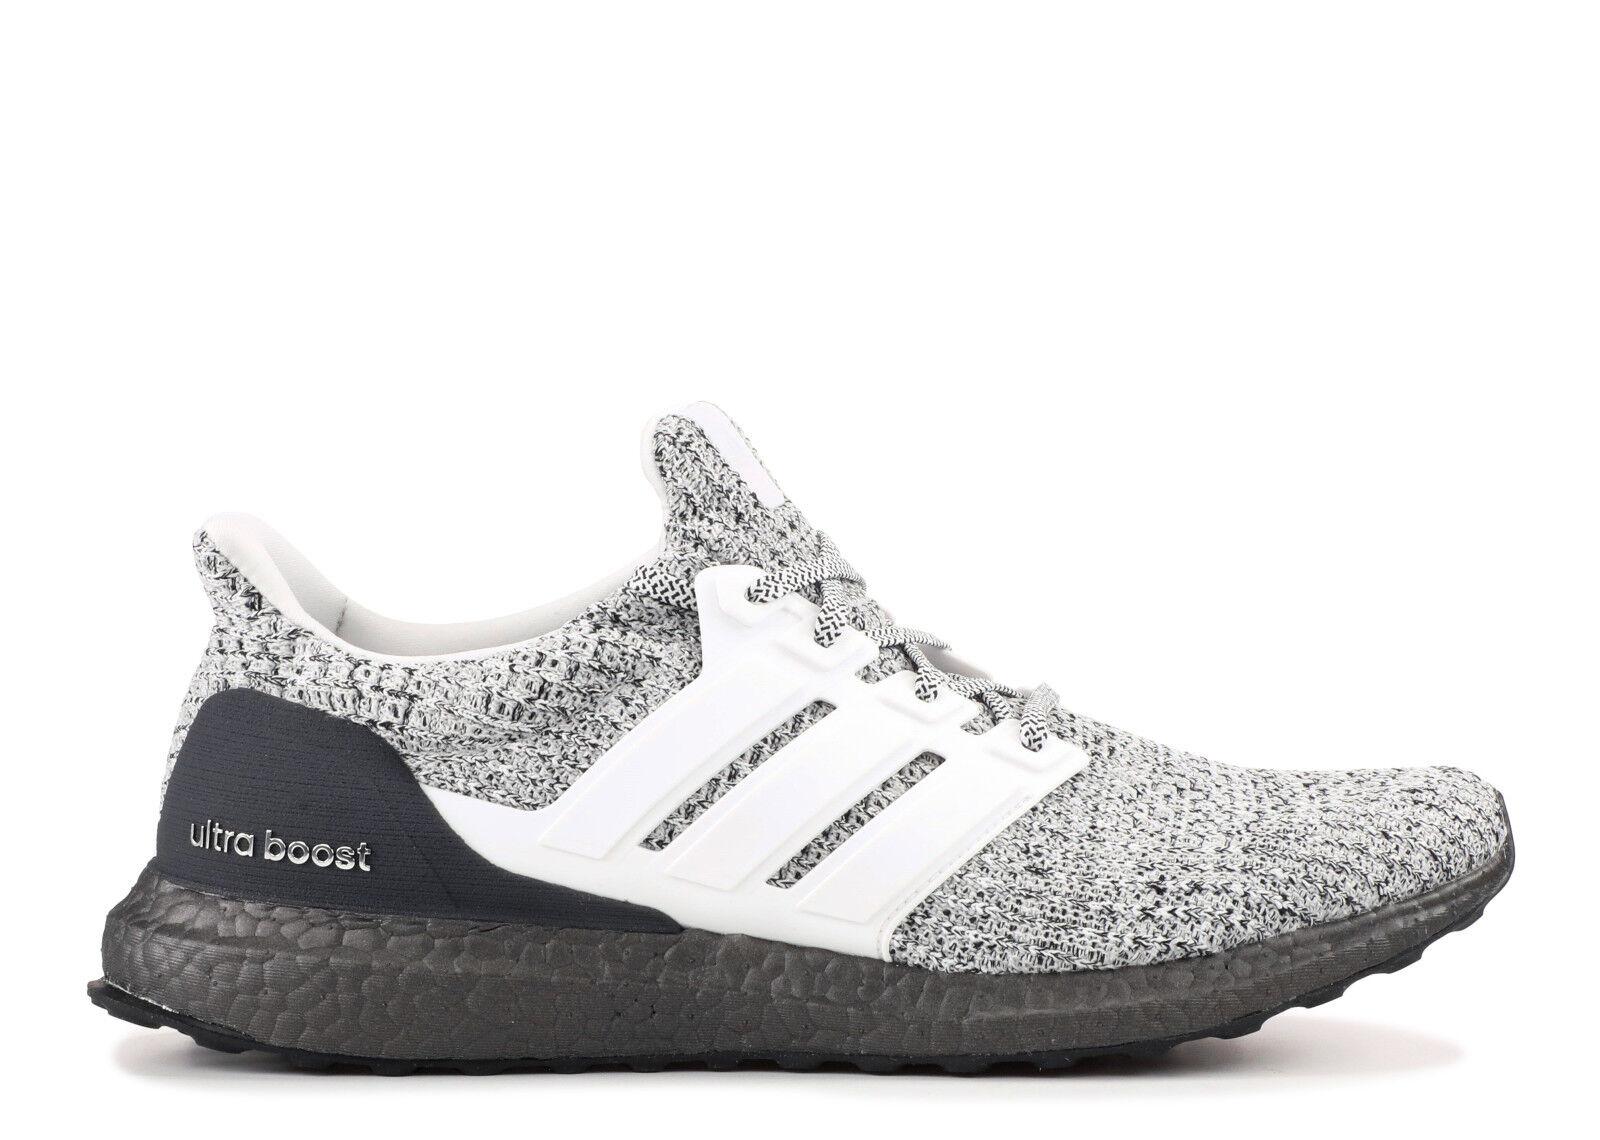 Adidas ultra impulso primeknit.bb6180. 4,0 oreo misura 7,5.bianchi e neri.pk primeknit.bb6180. impulso 393678